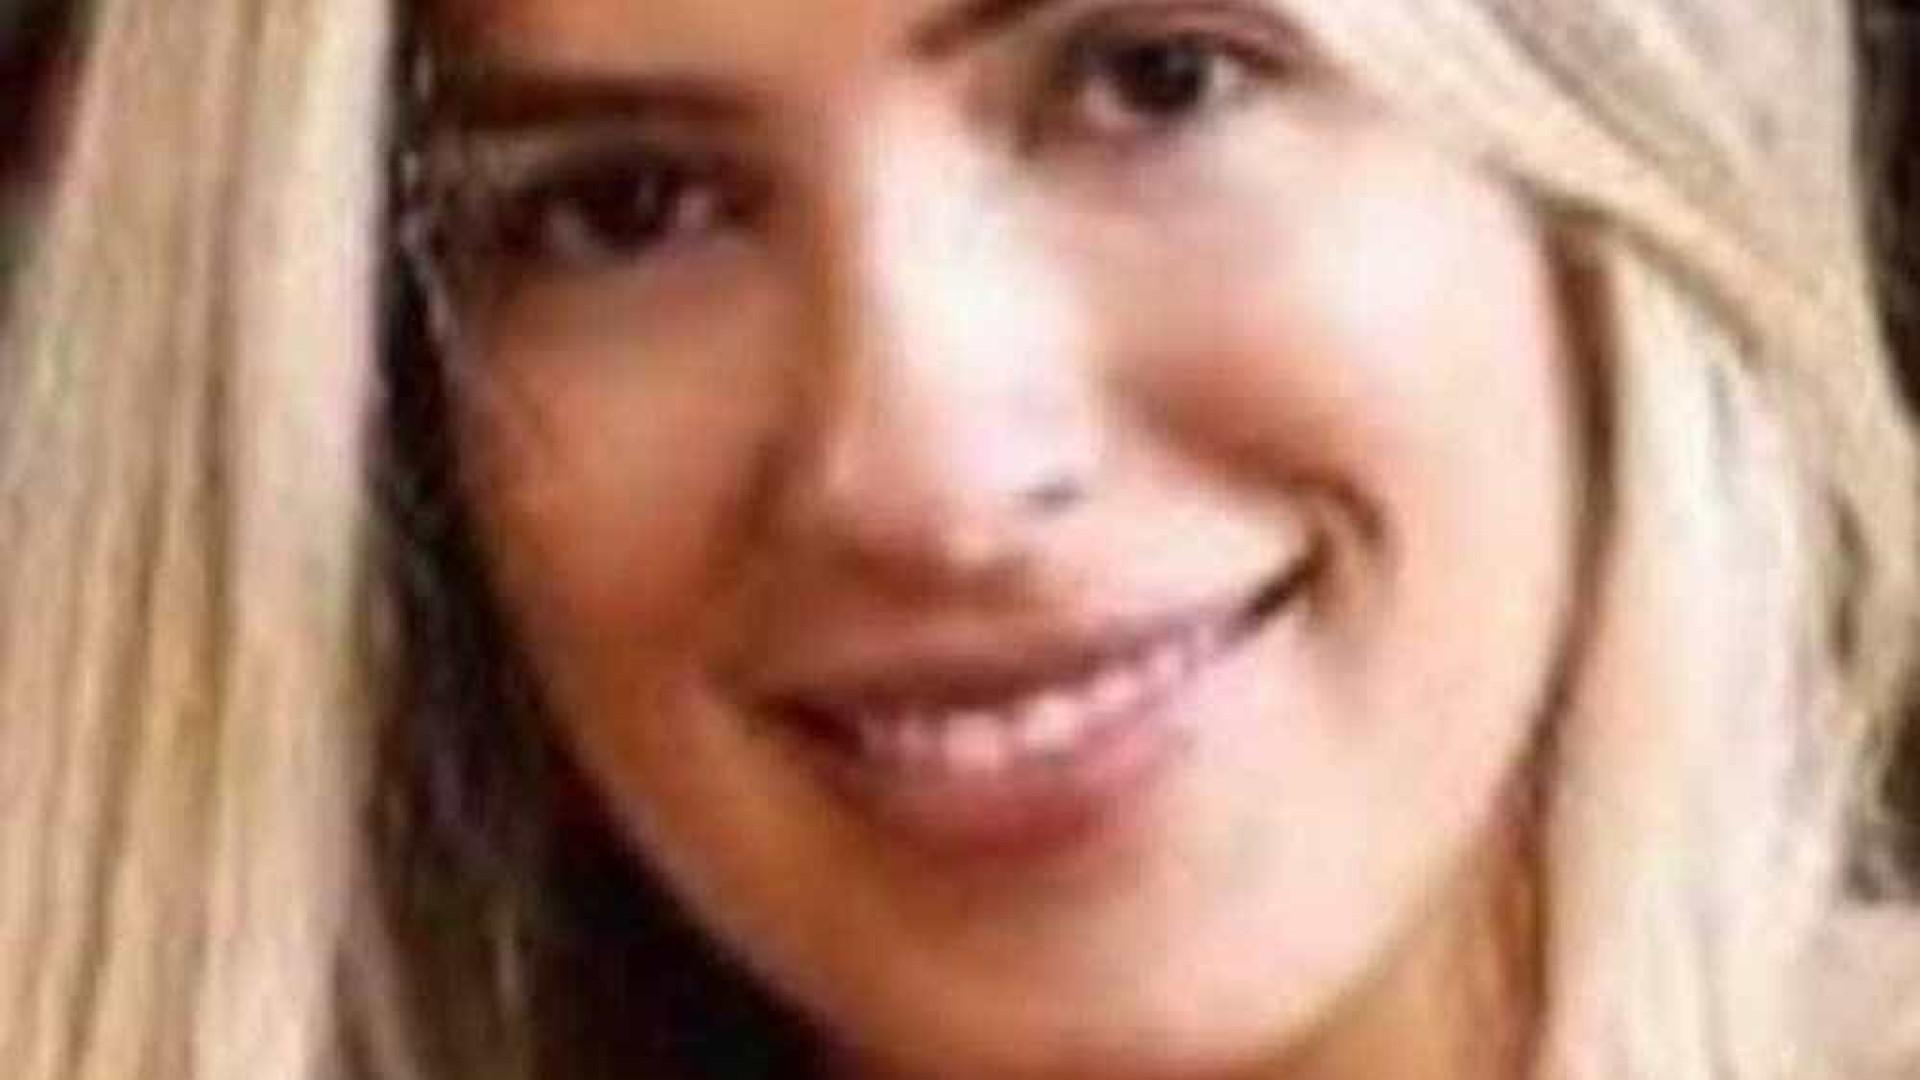 Médica da Vale, 1ª vítima identificada, comemorou aniversário na quinta